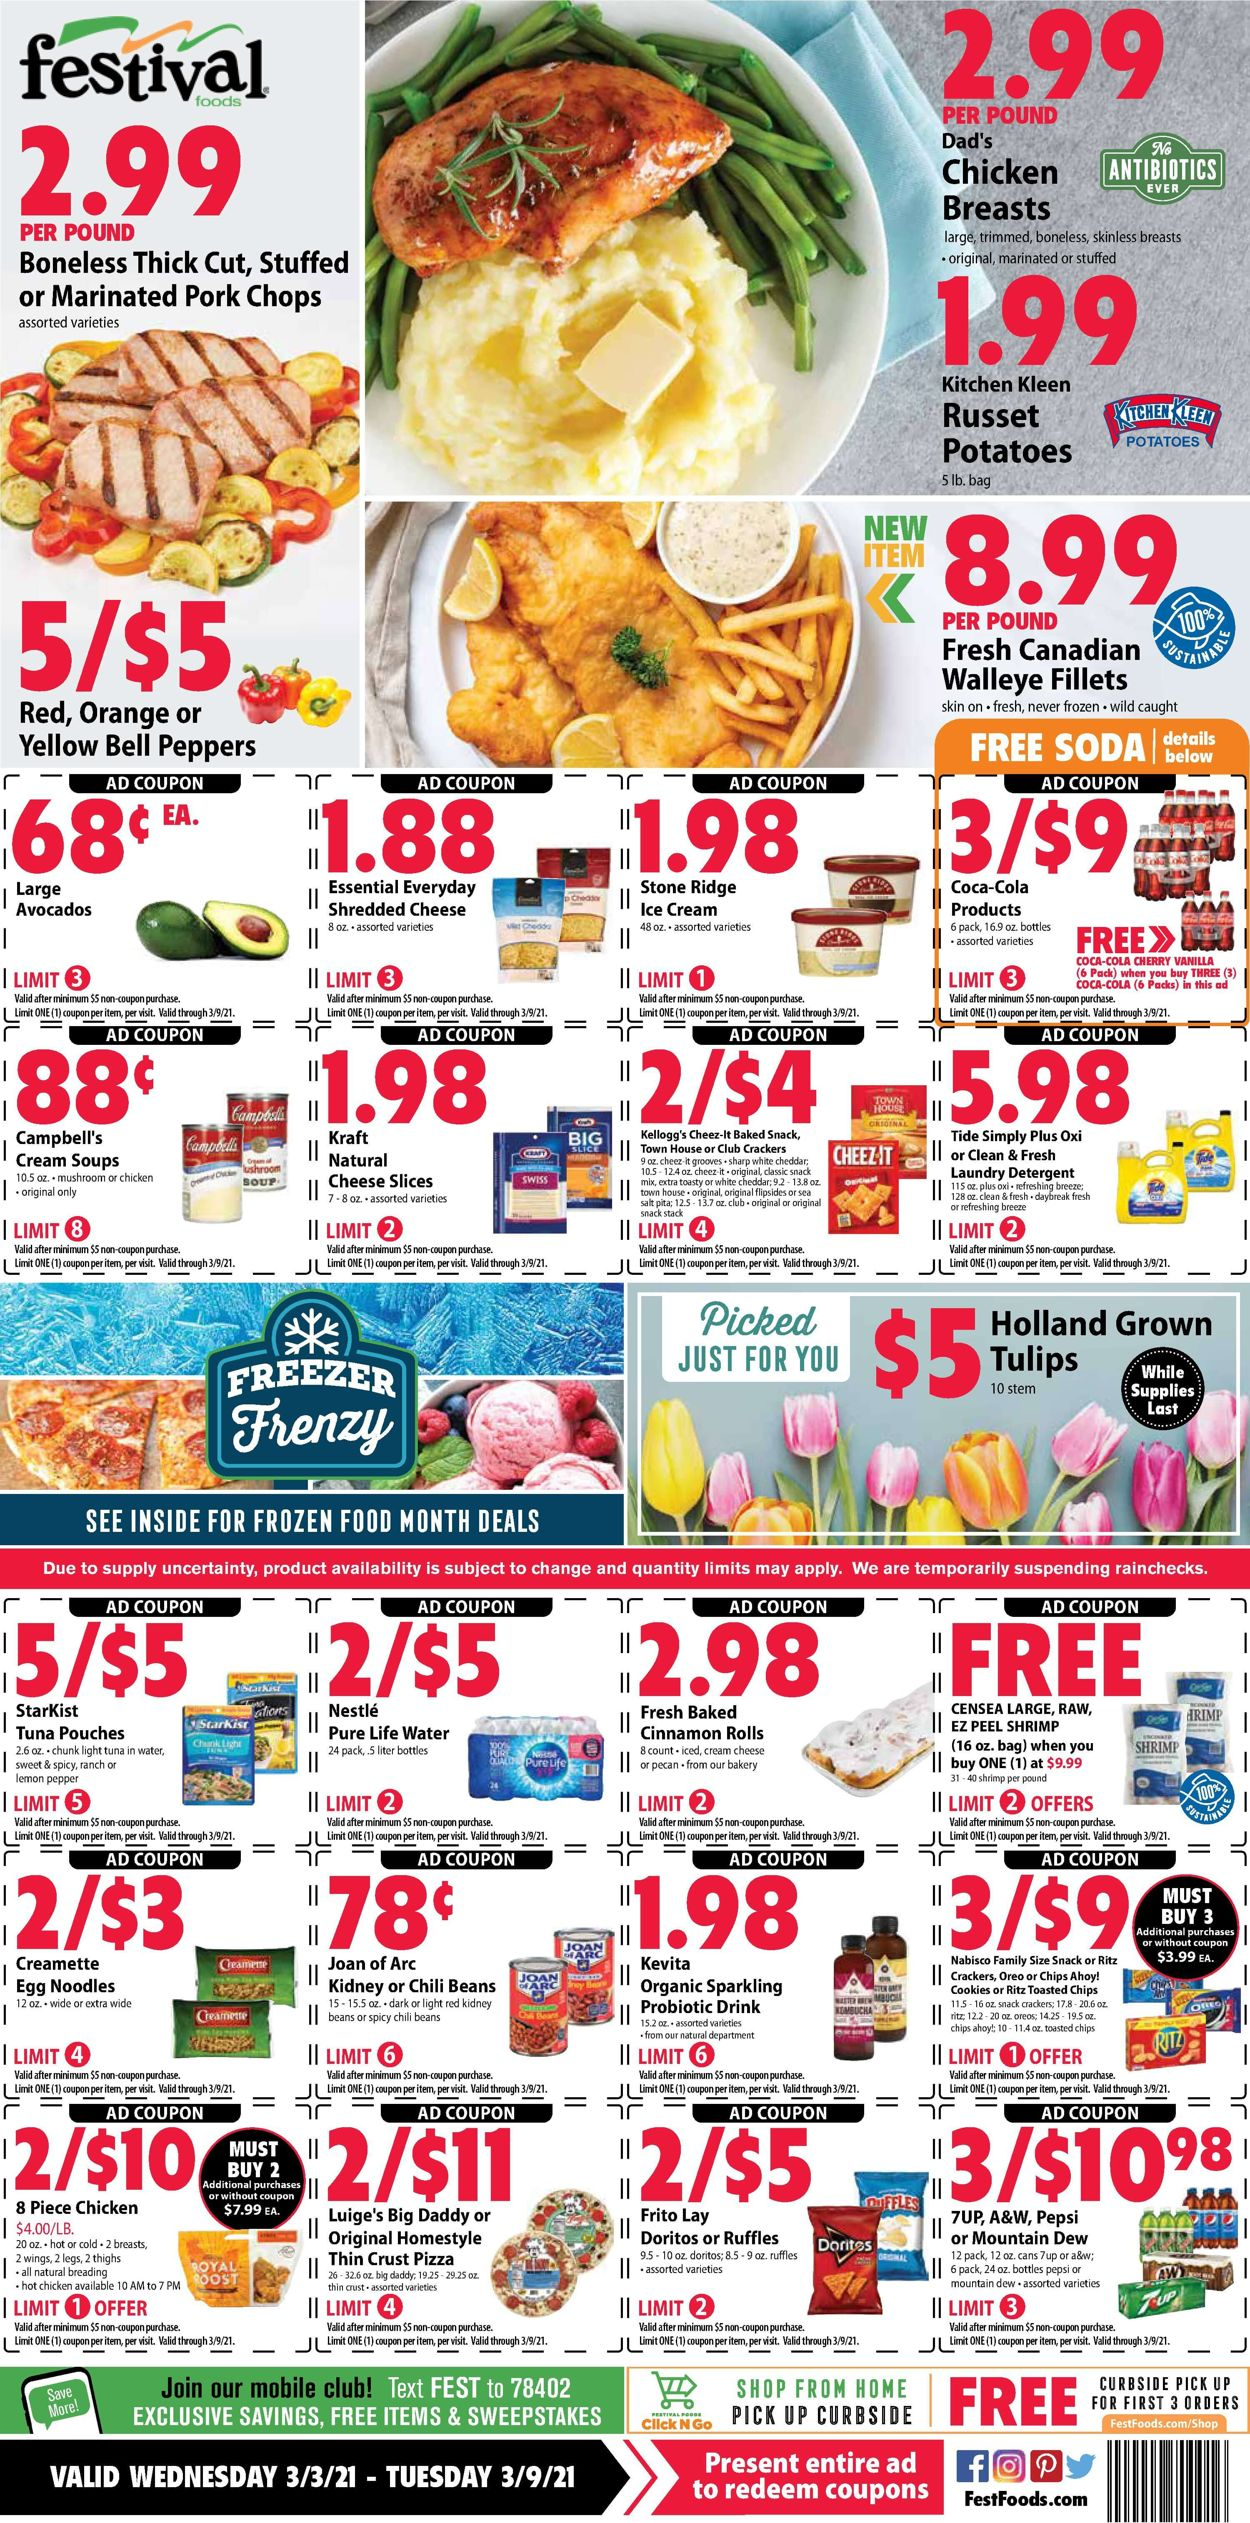 Festival Foods Weekly Ad Circular - valid 03/03-03/09/2021